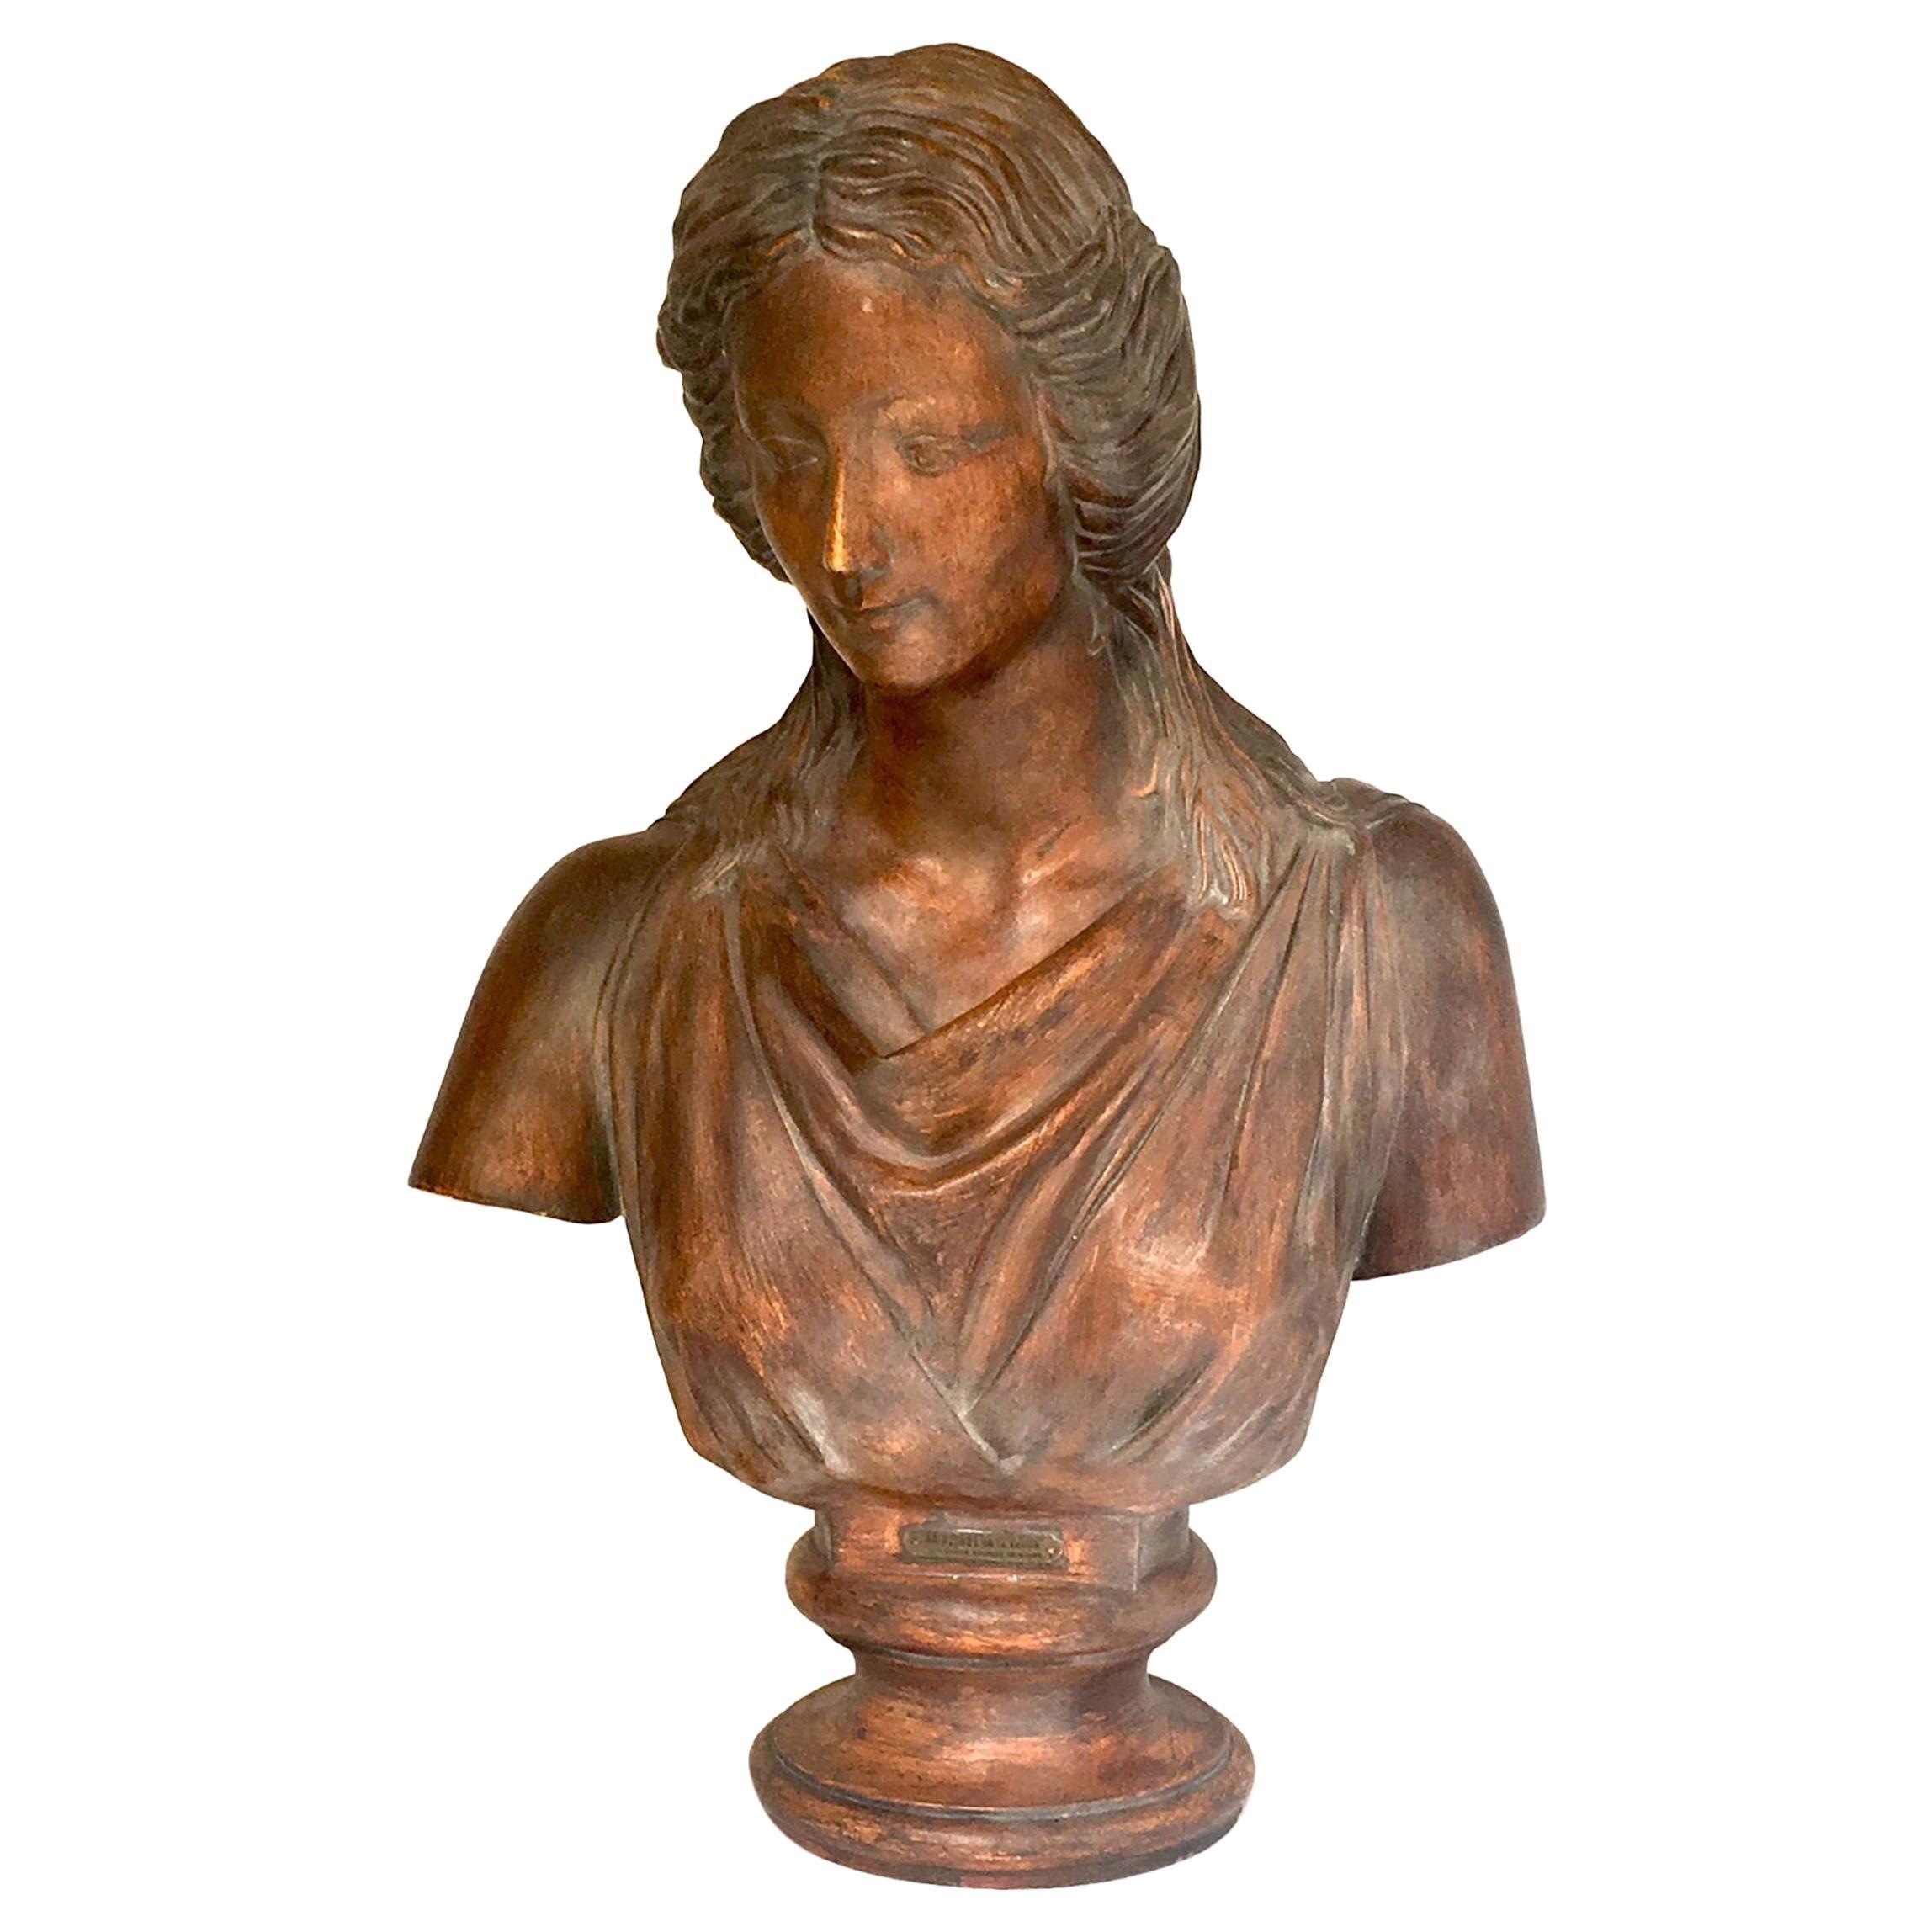 Terracotta Bust by Louis Moreau